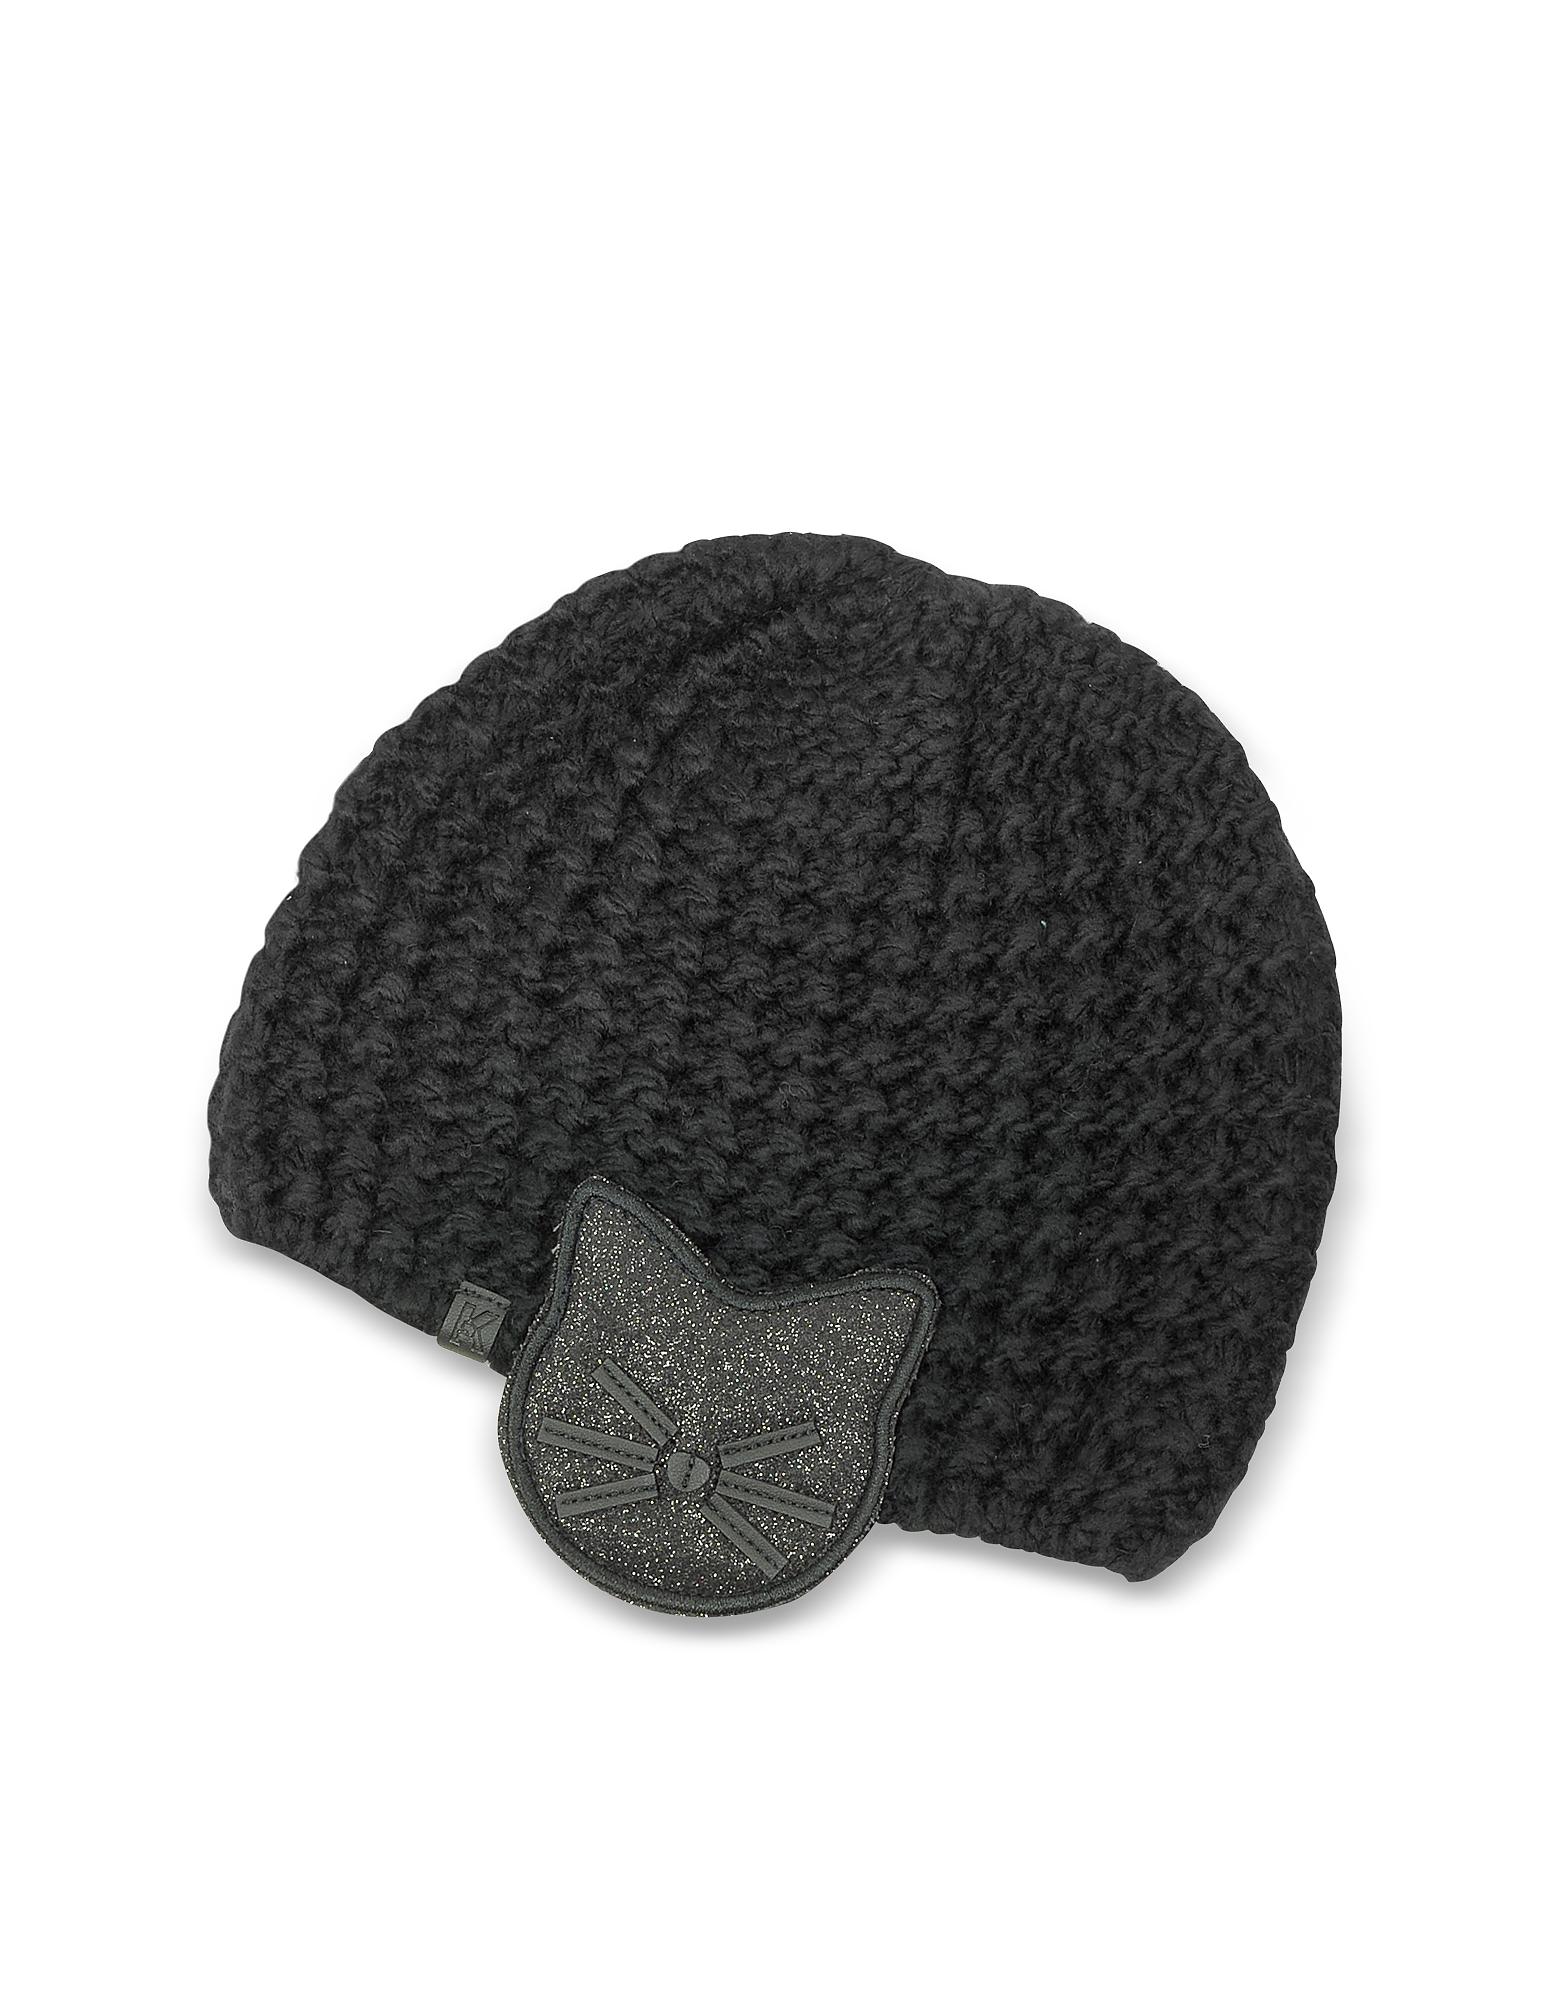 Black Choupette Earmuff Knit Hat от Forzieri.com INT